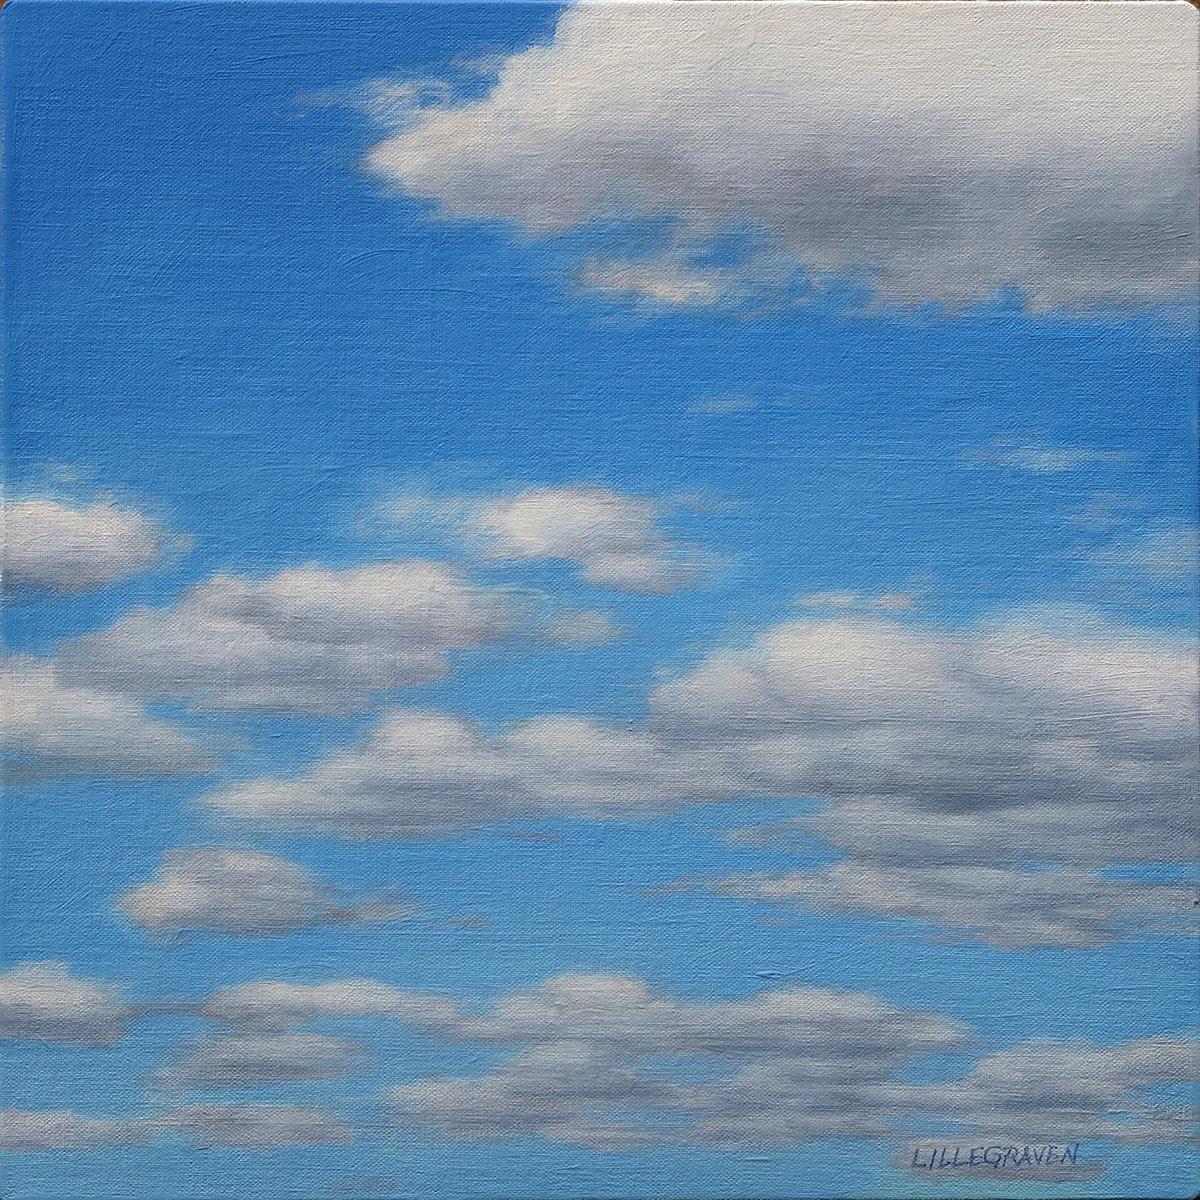 Linda Lillegraven - Western Skies 3